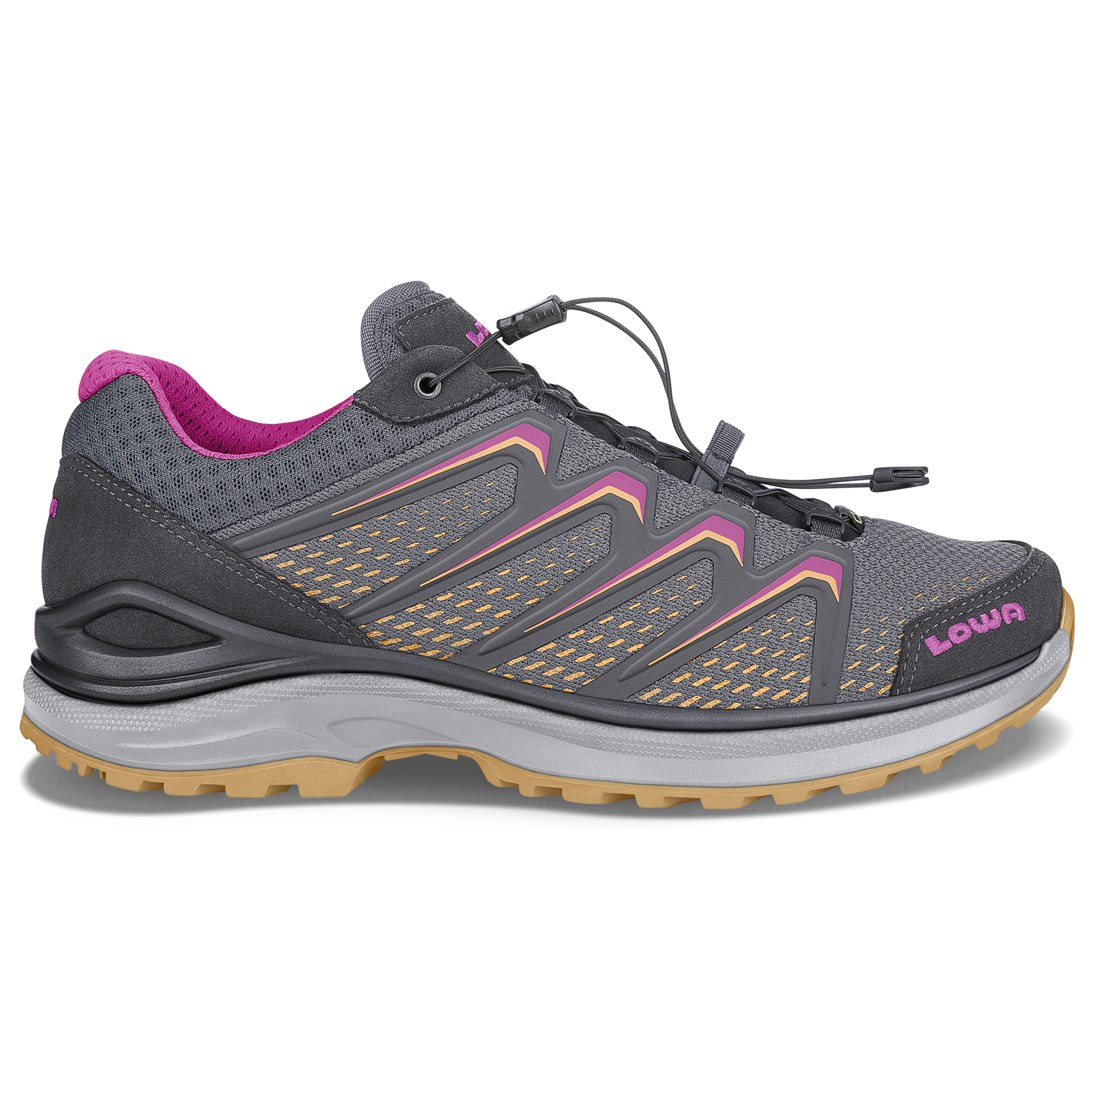 LOWA Maddox GTX LO Ws Women's Shoe - grey/mandarin